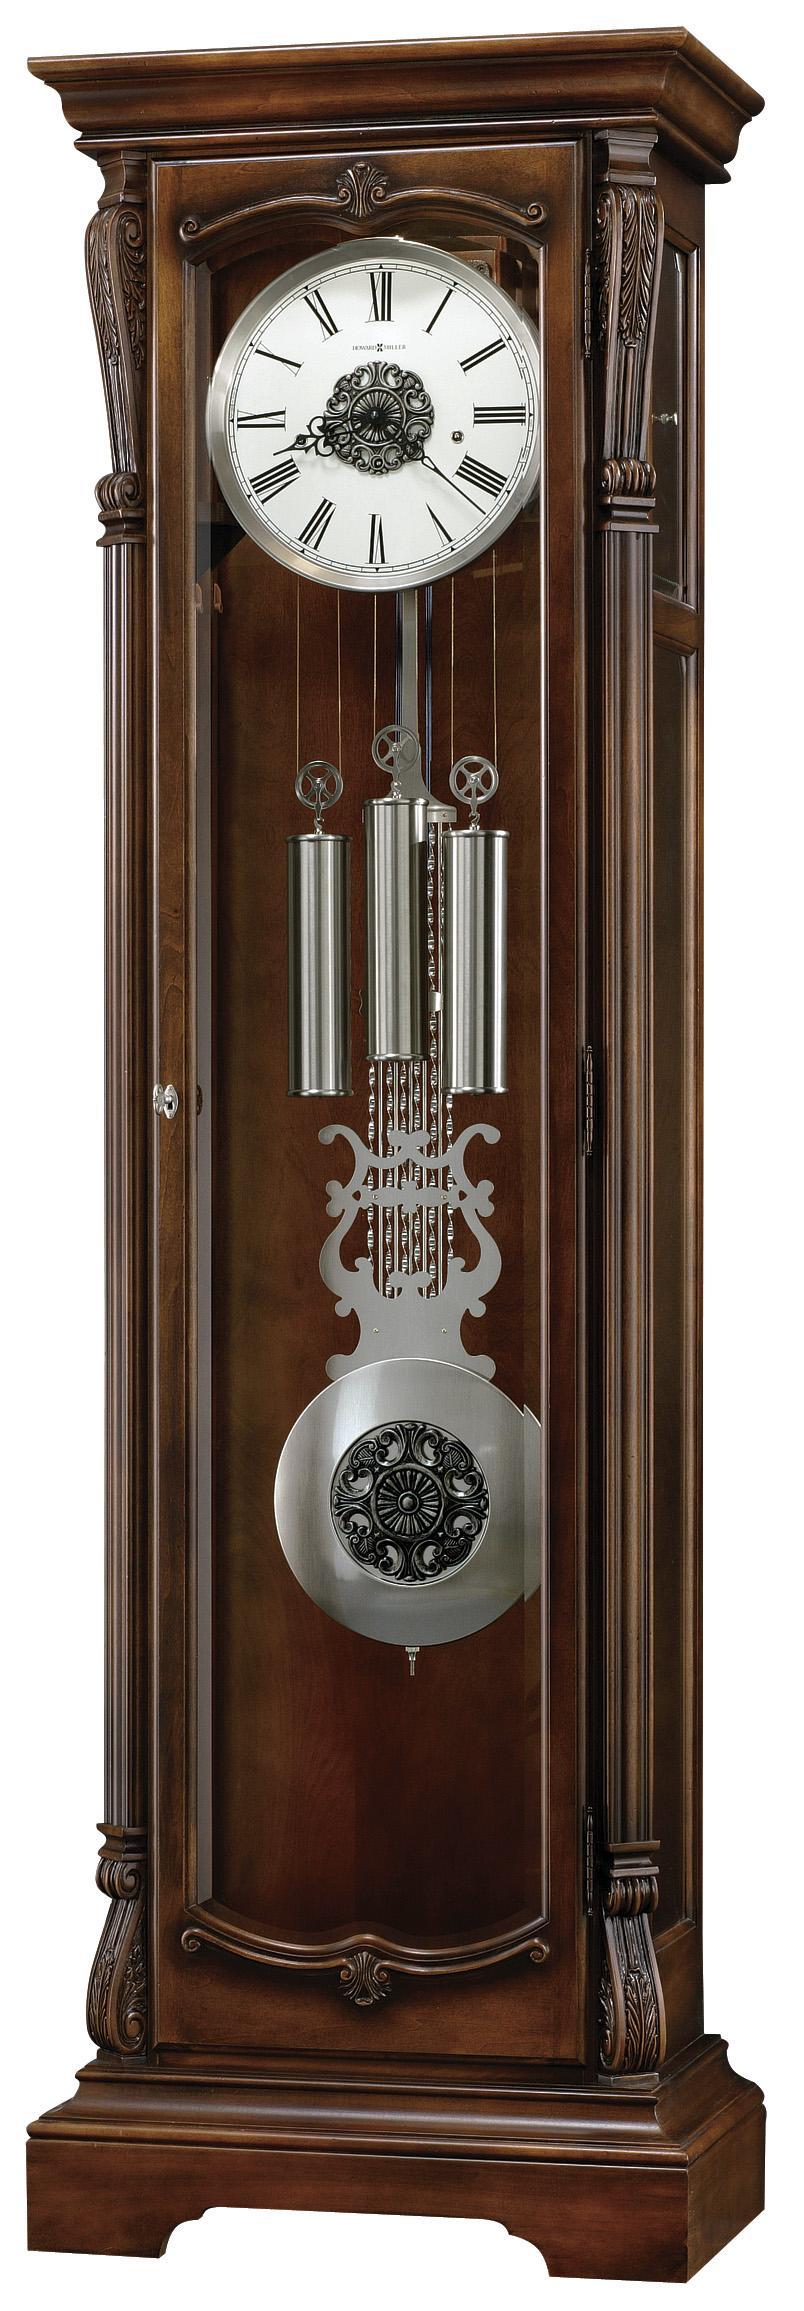 Howard Miller Clocks Wellington Grandfather Clock - Item Number: 611-122